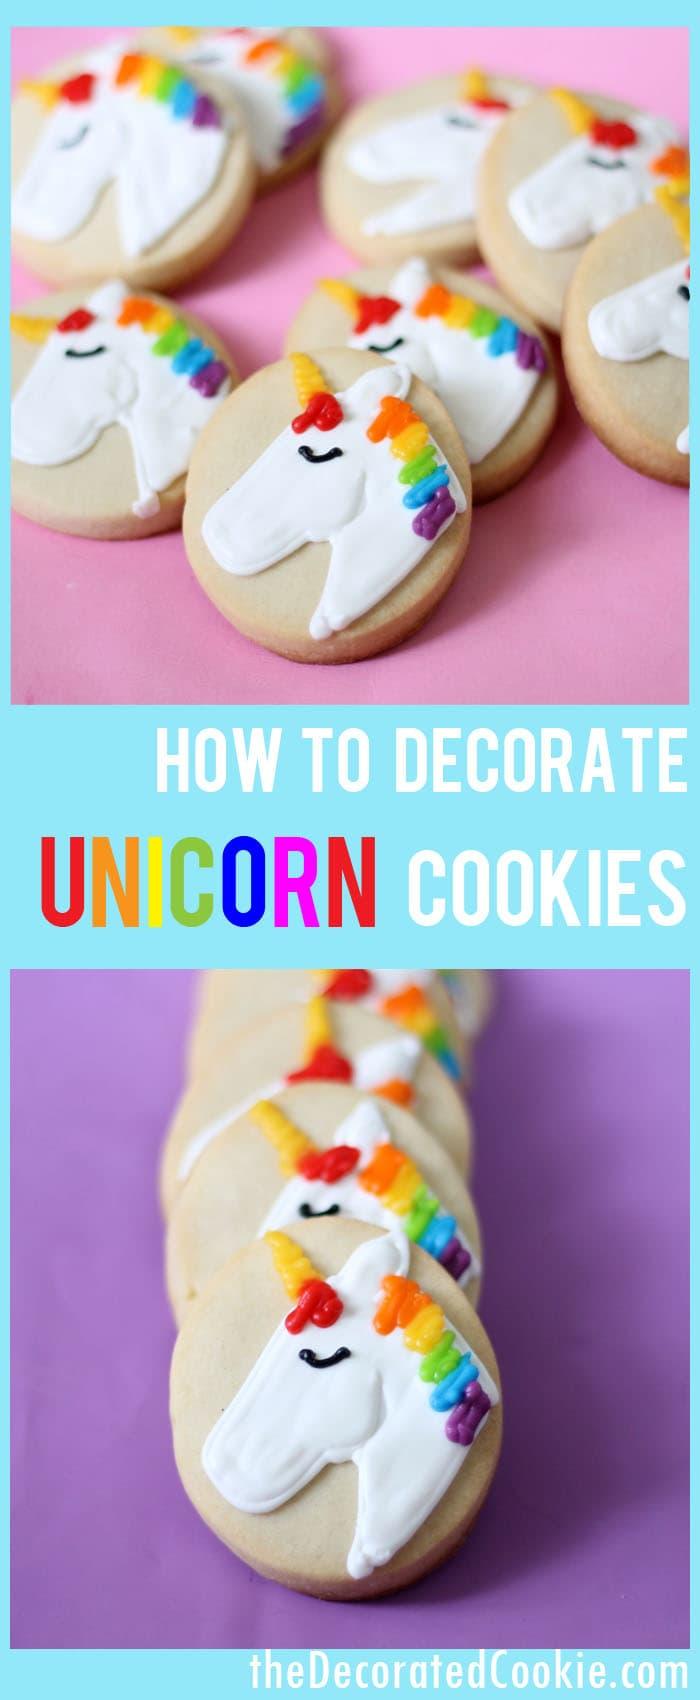 how to decorate simple unicorn cookies unicorn food unicorn party - How To Decorate Cookies